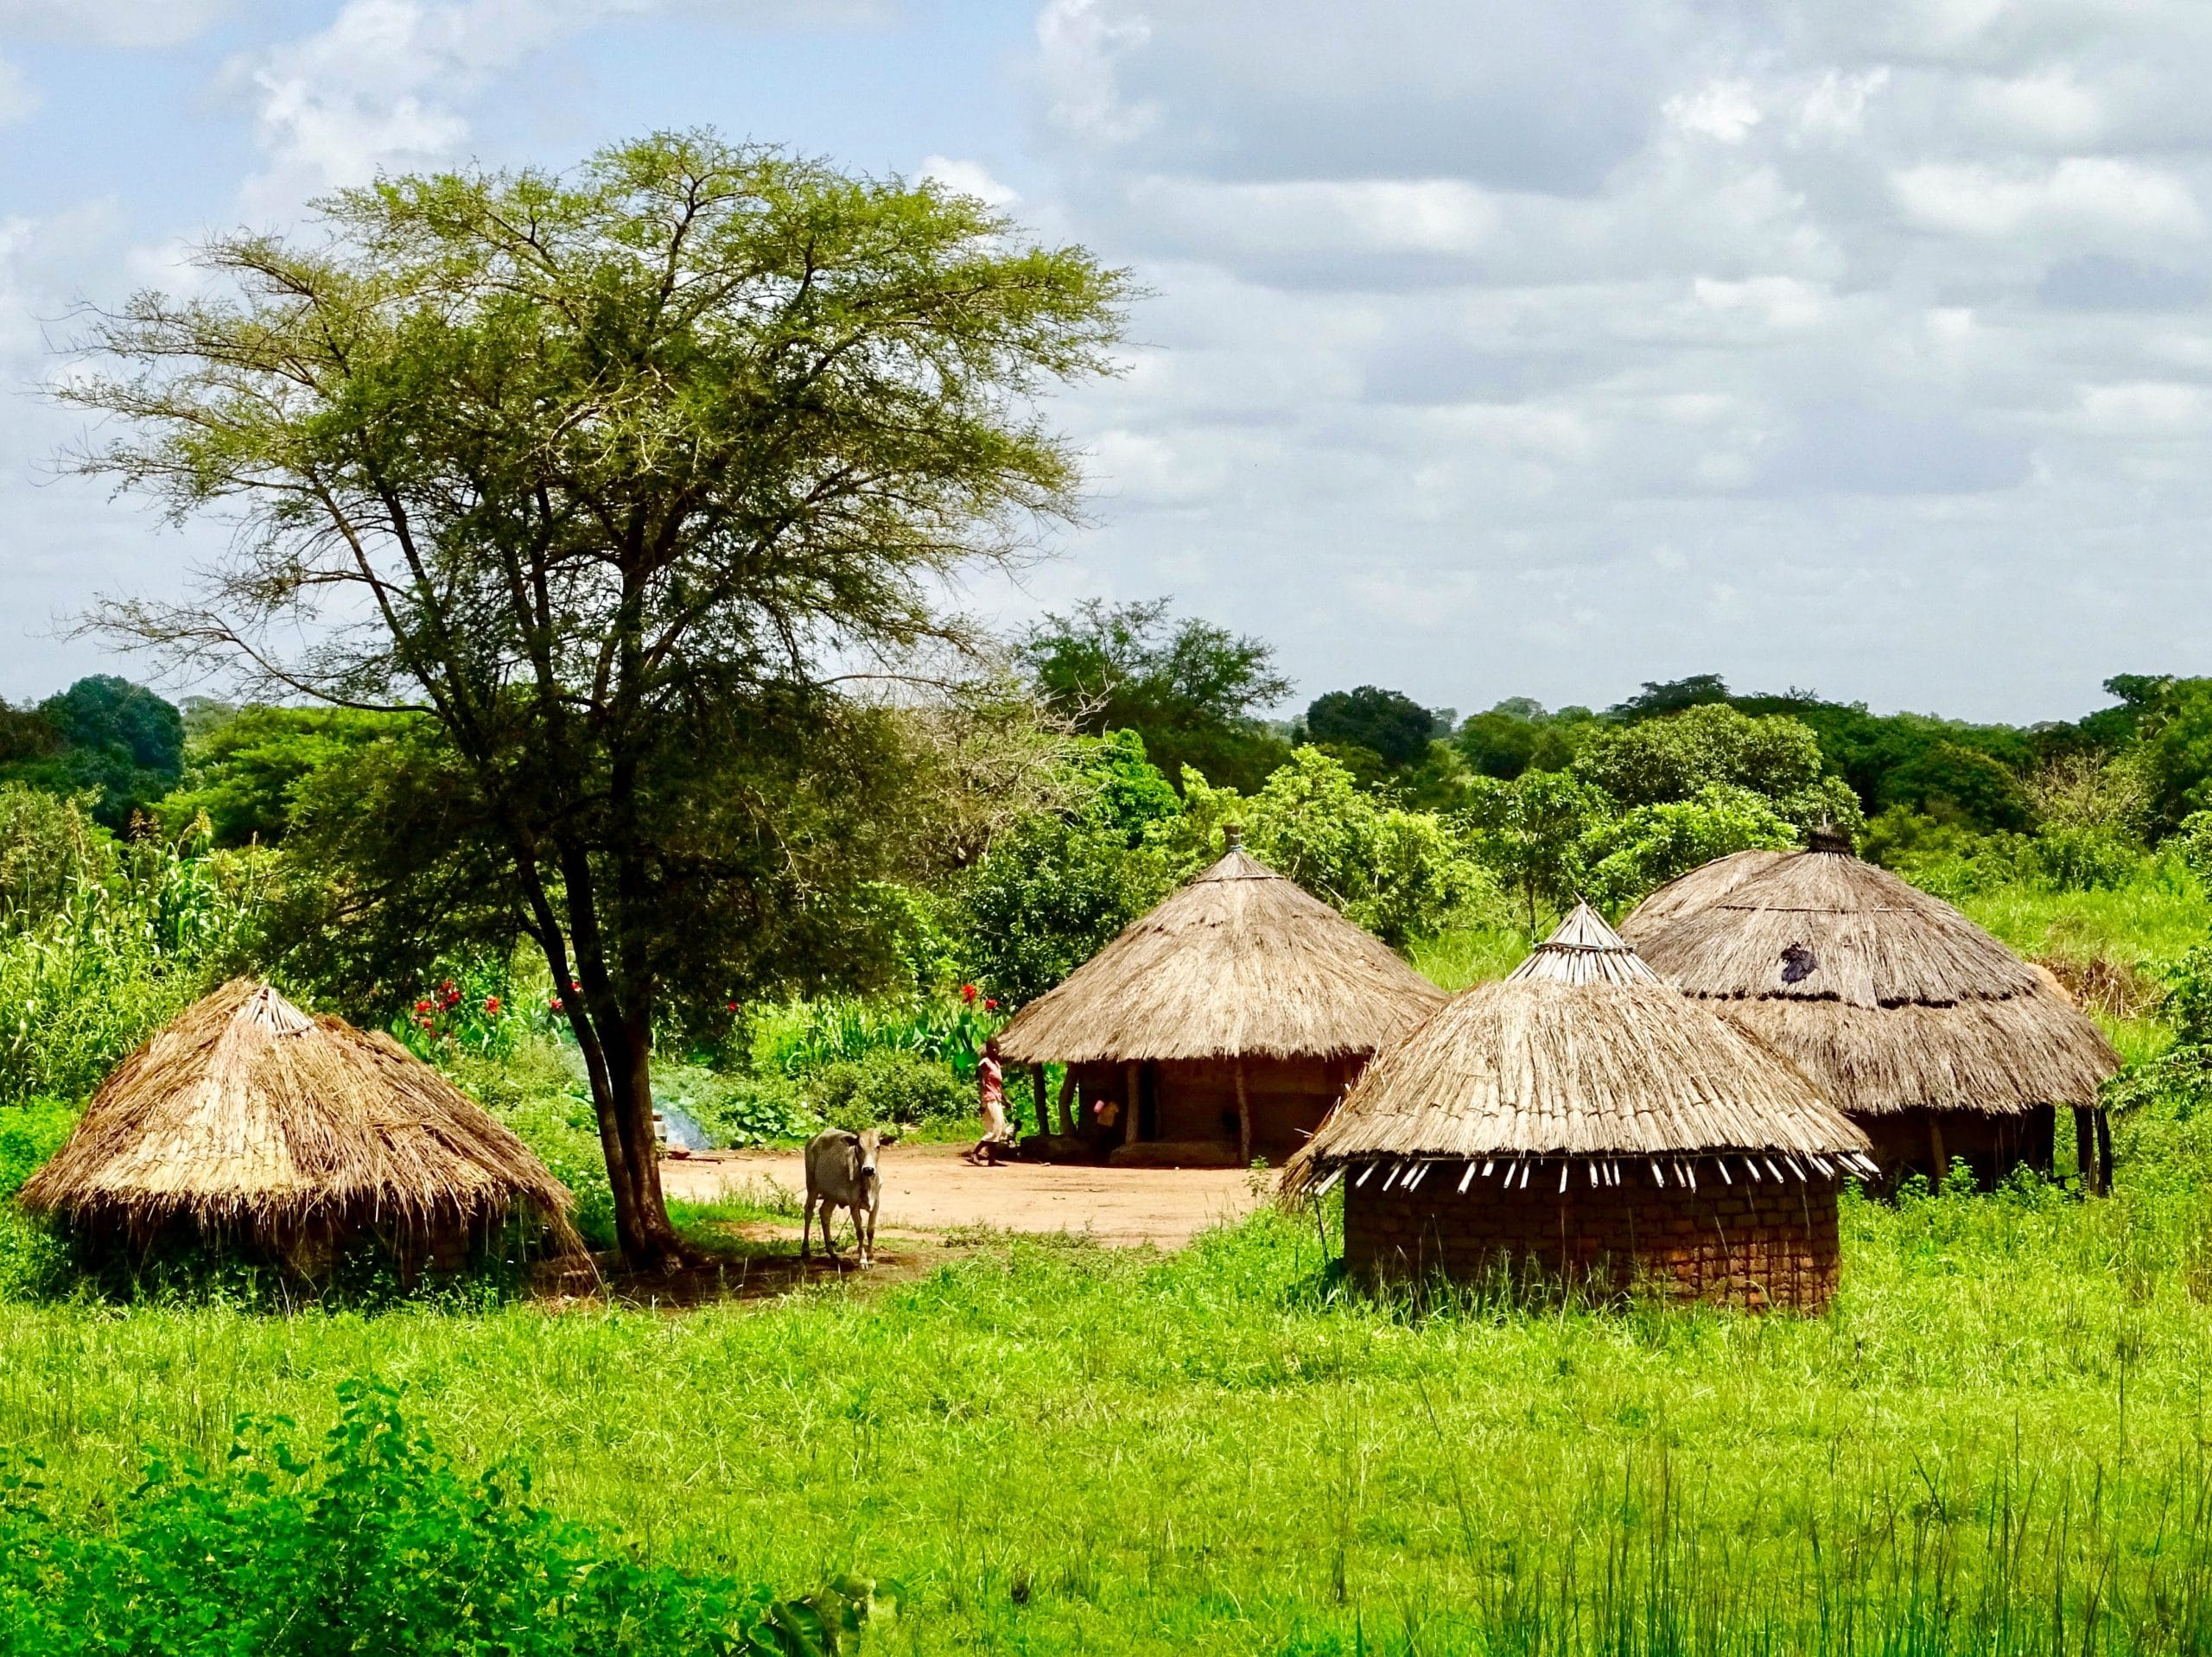 Karakteristieke Acholi nederzetting op de weg naar Gulu